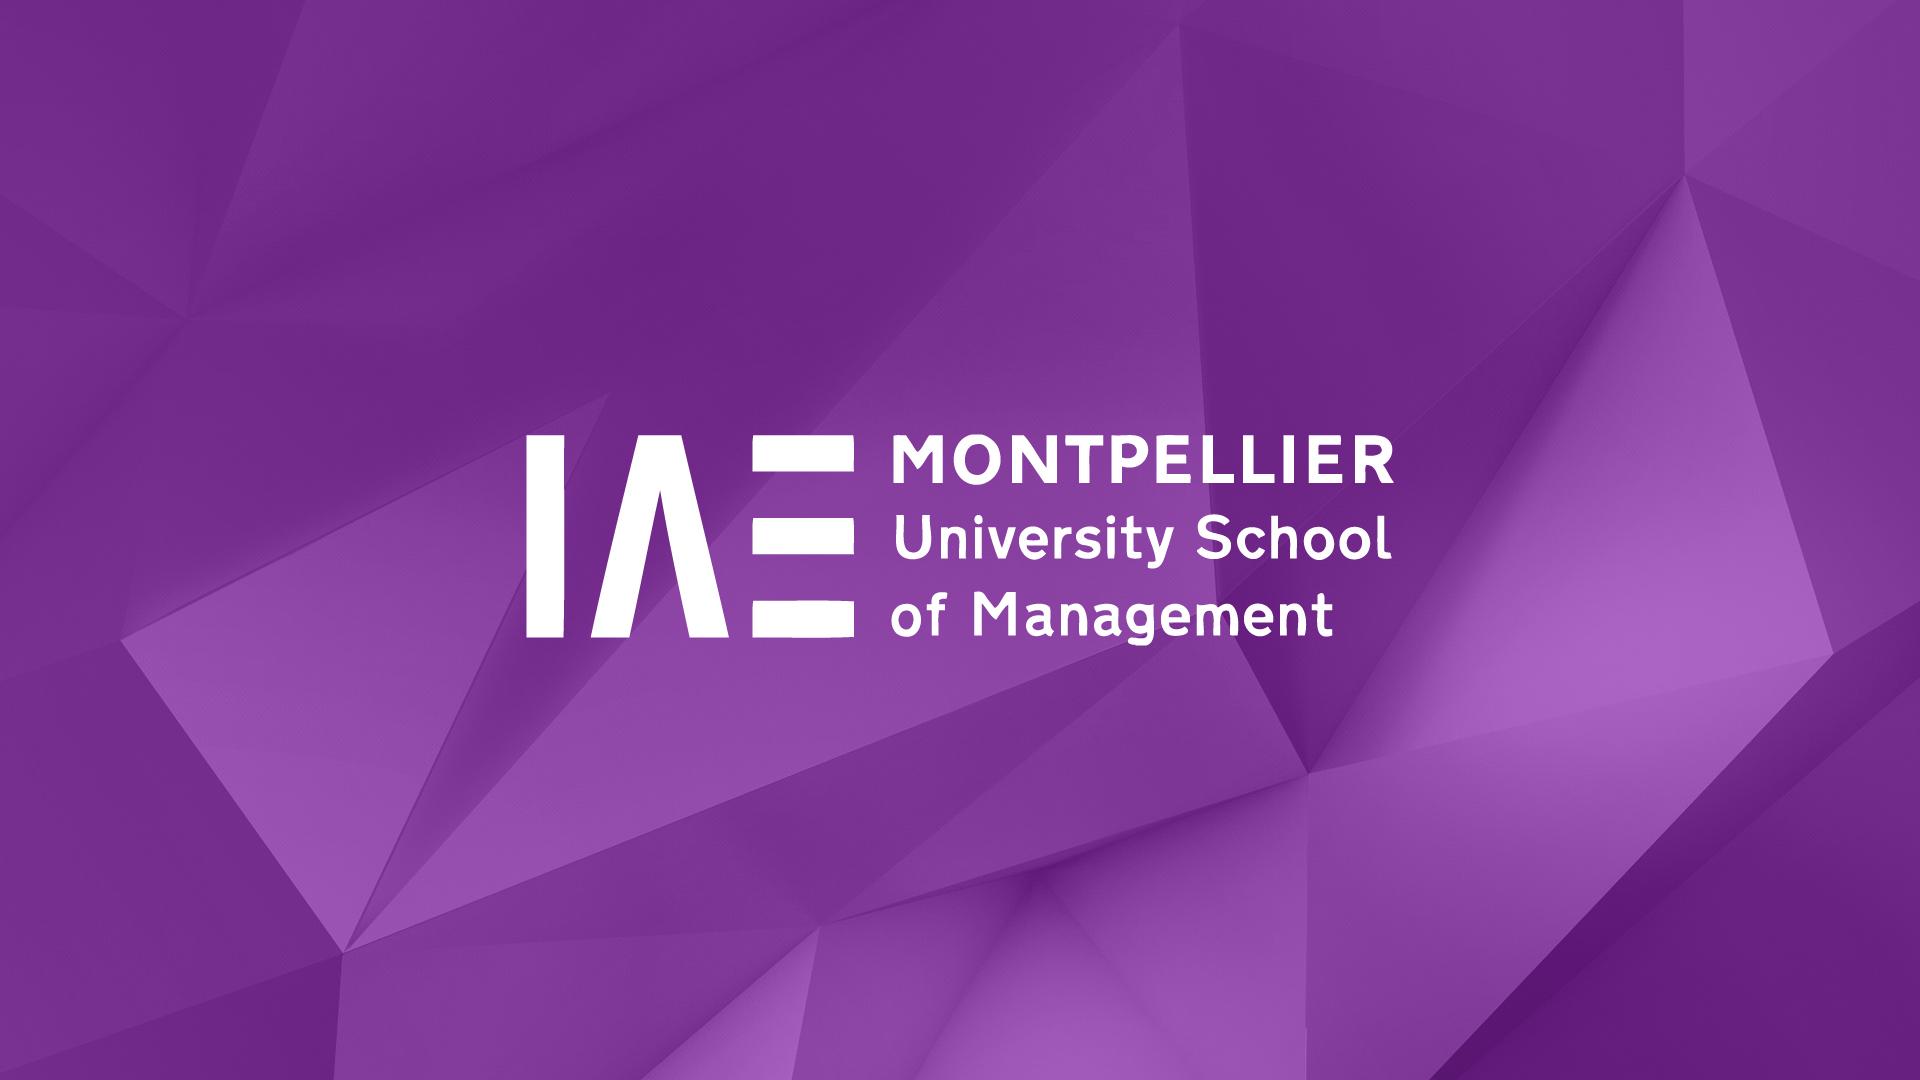 iae-montpellier-creation-plaquette-brochure-fiches-diplomes-communication-caconcept-alexis-cretin-graphiste